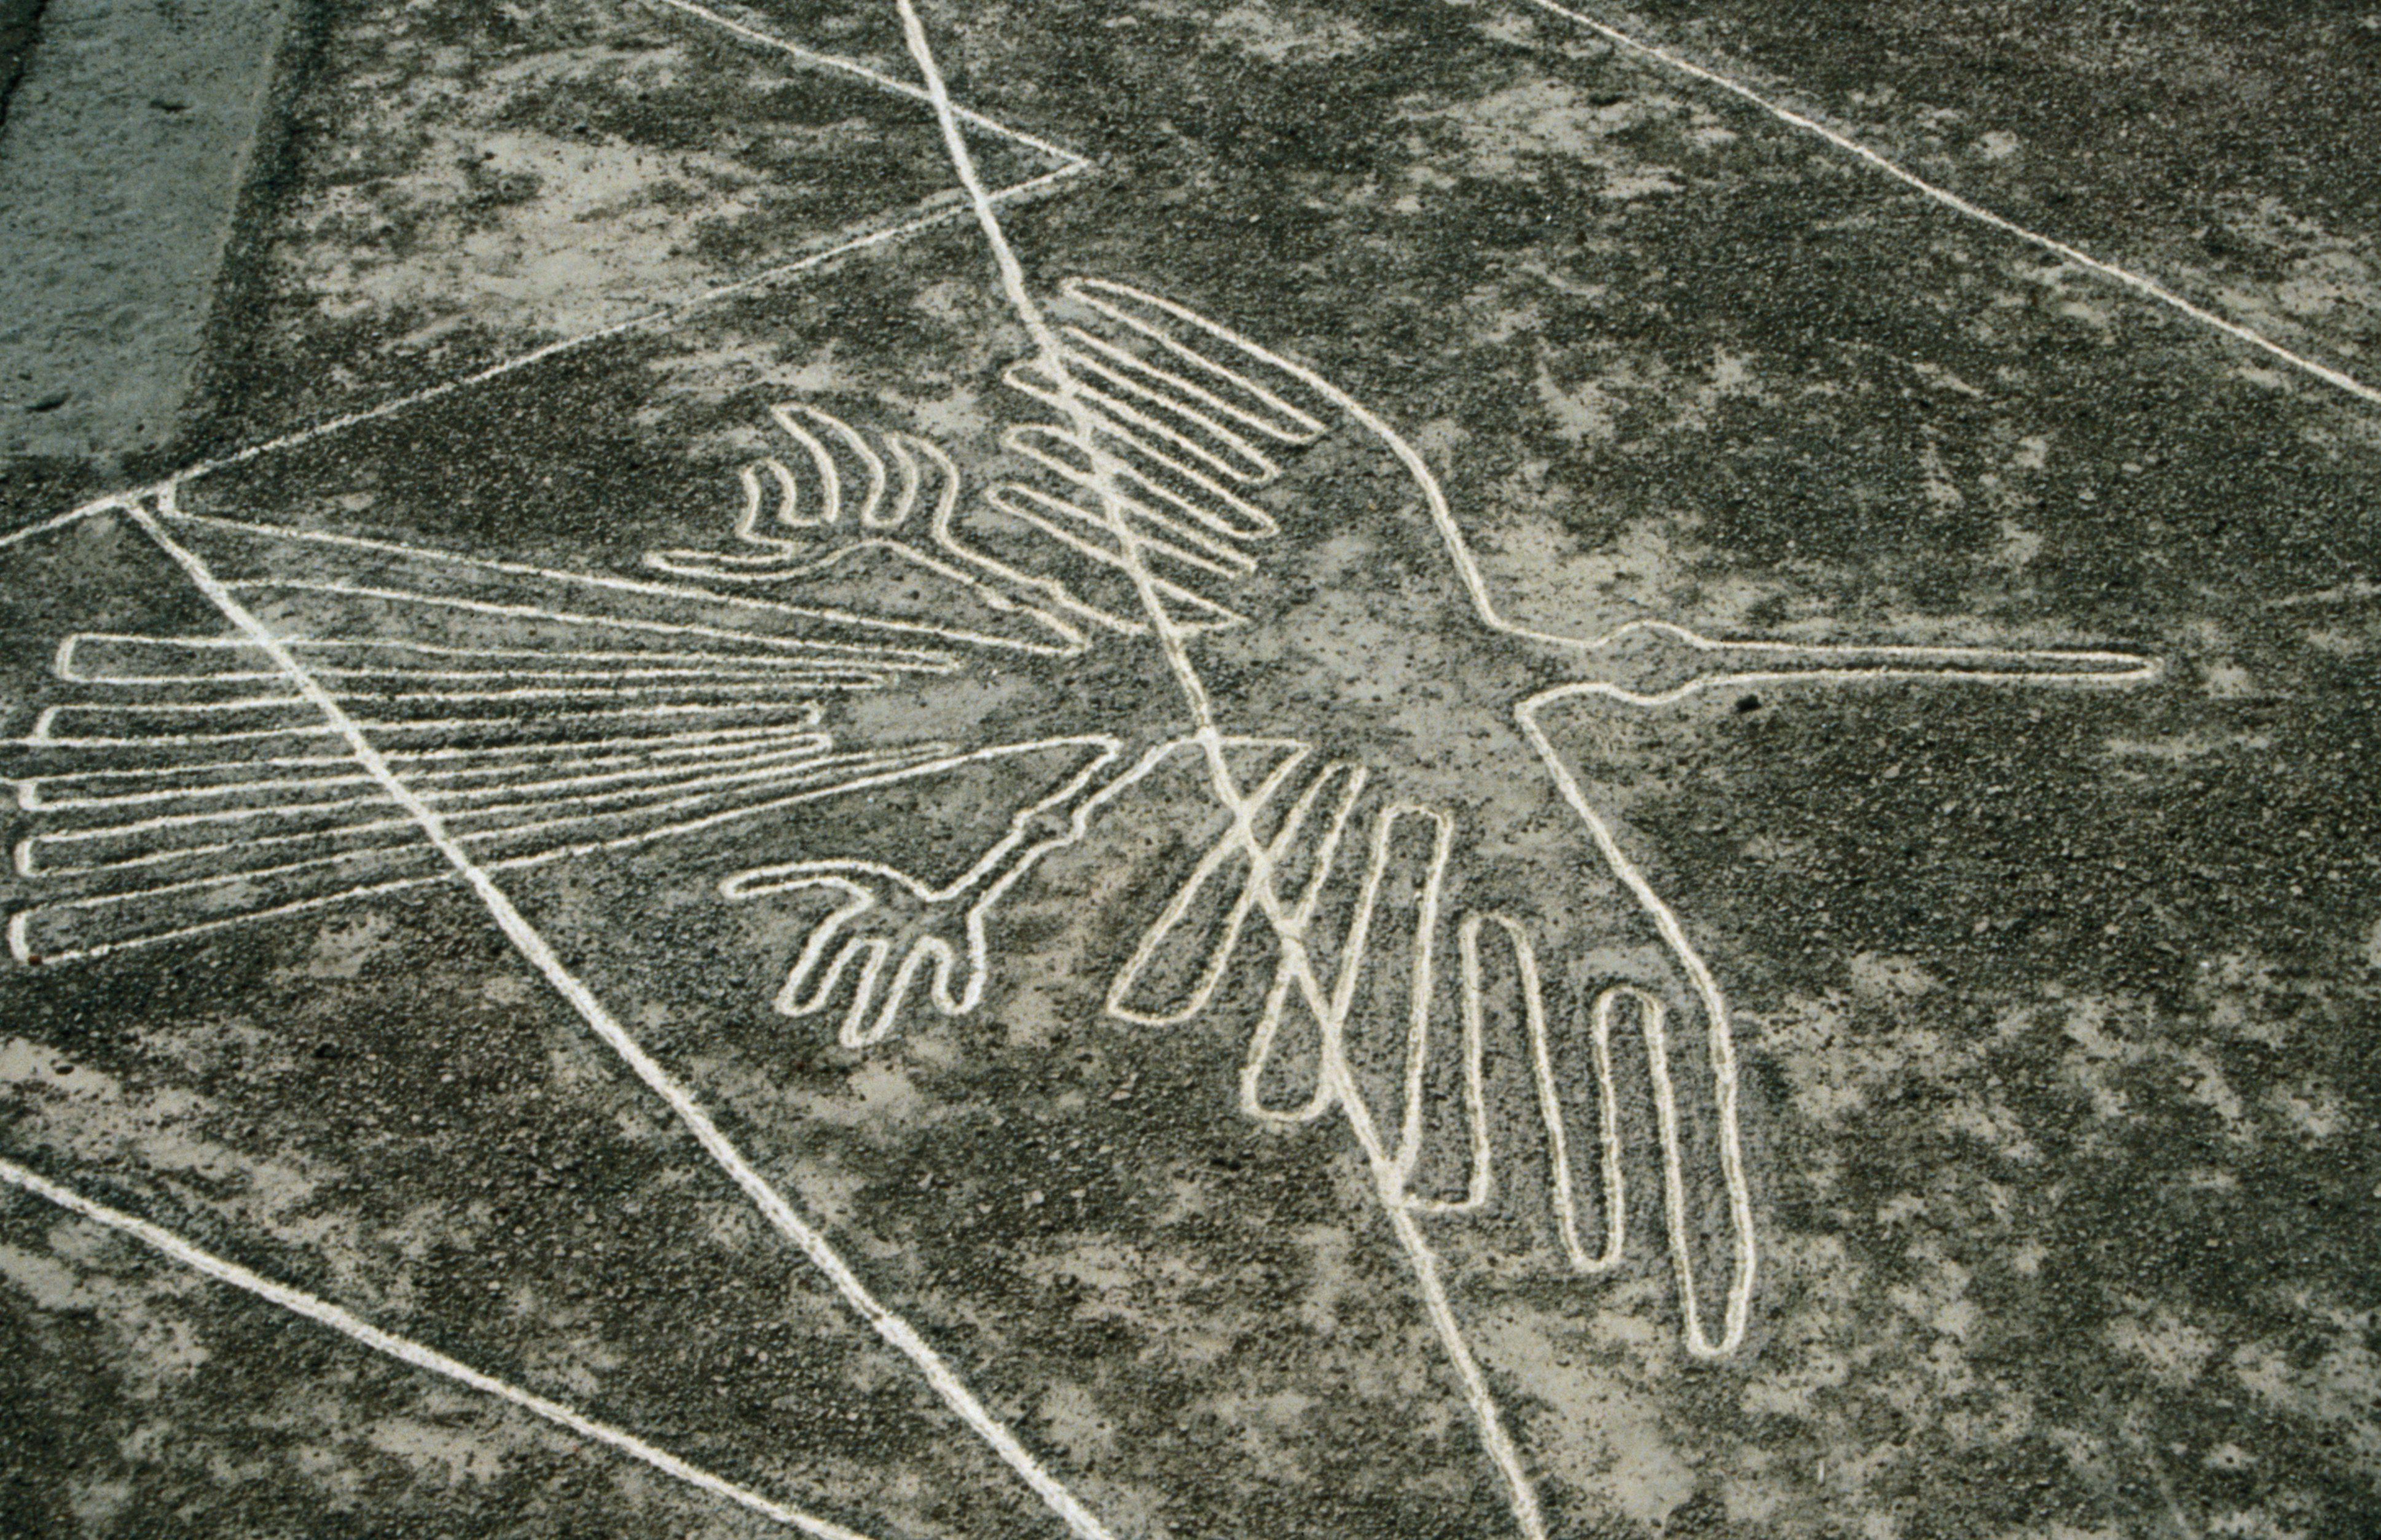 A representation of the Nazca Lines (The Condor) at the Nazca Museum.